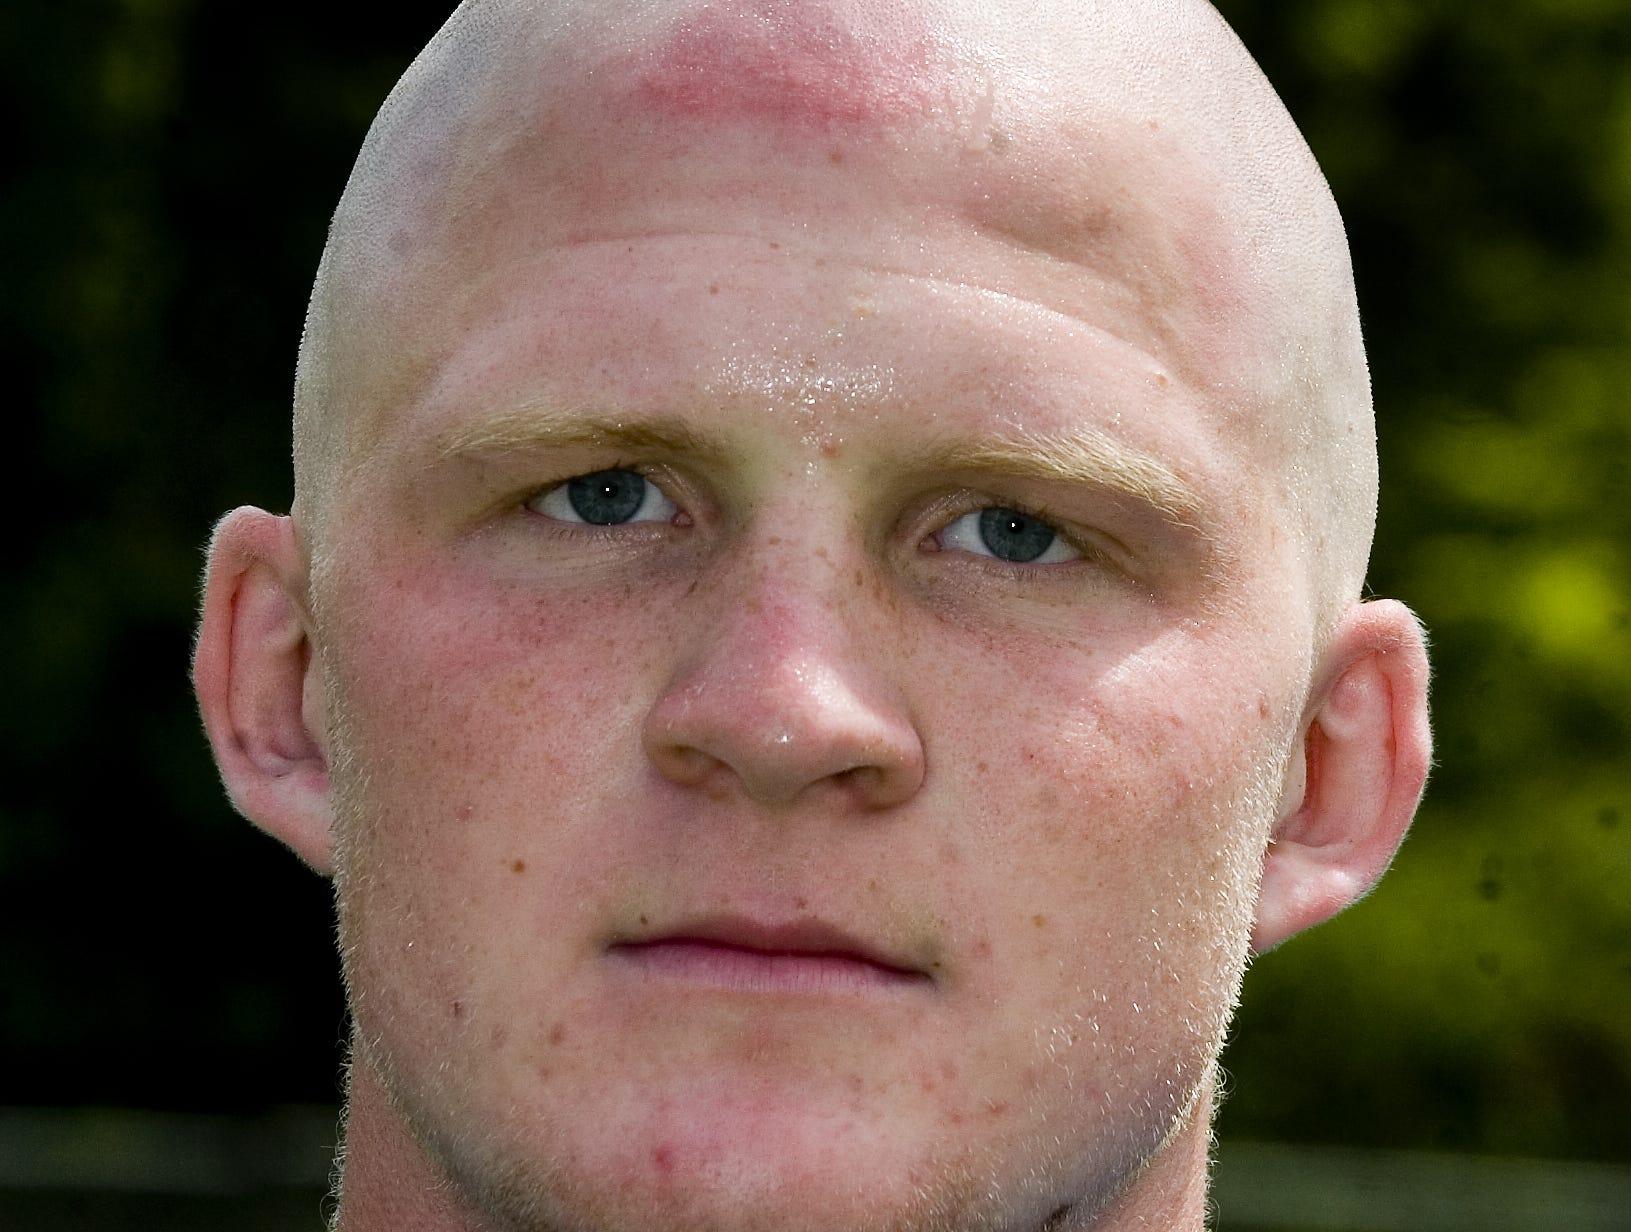 Maine-Endwell's football Mitch Tallon, 2008